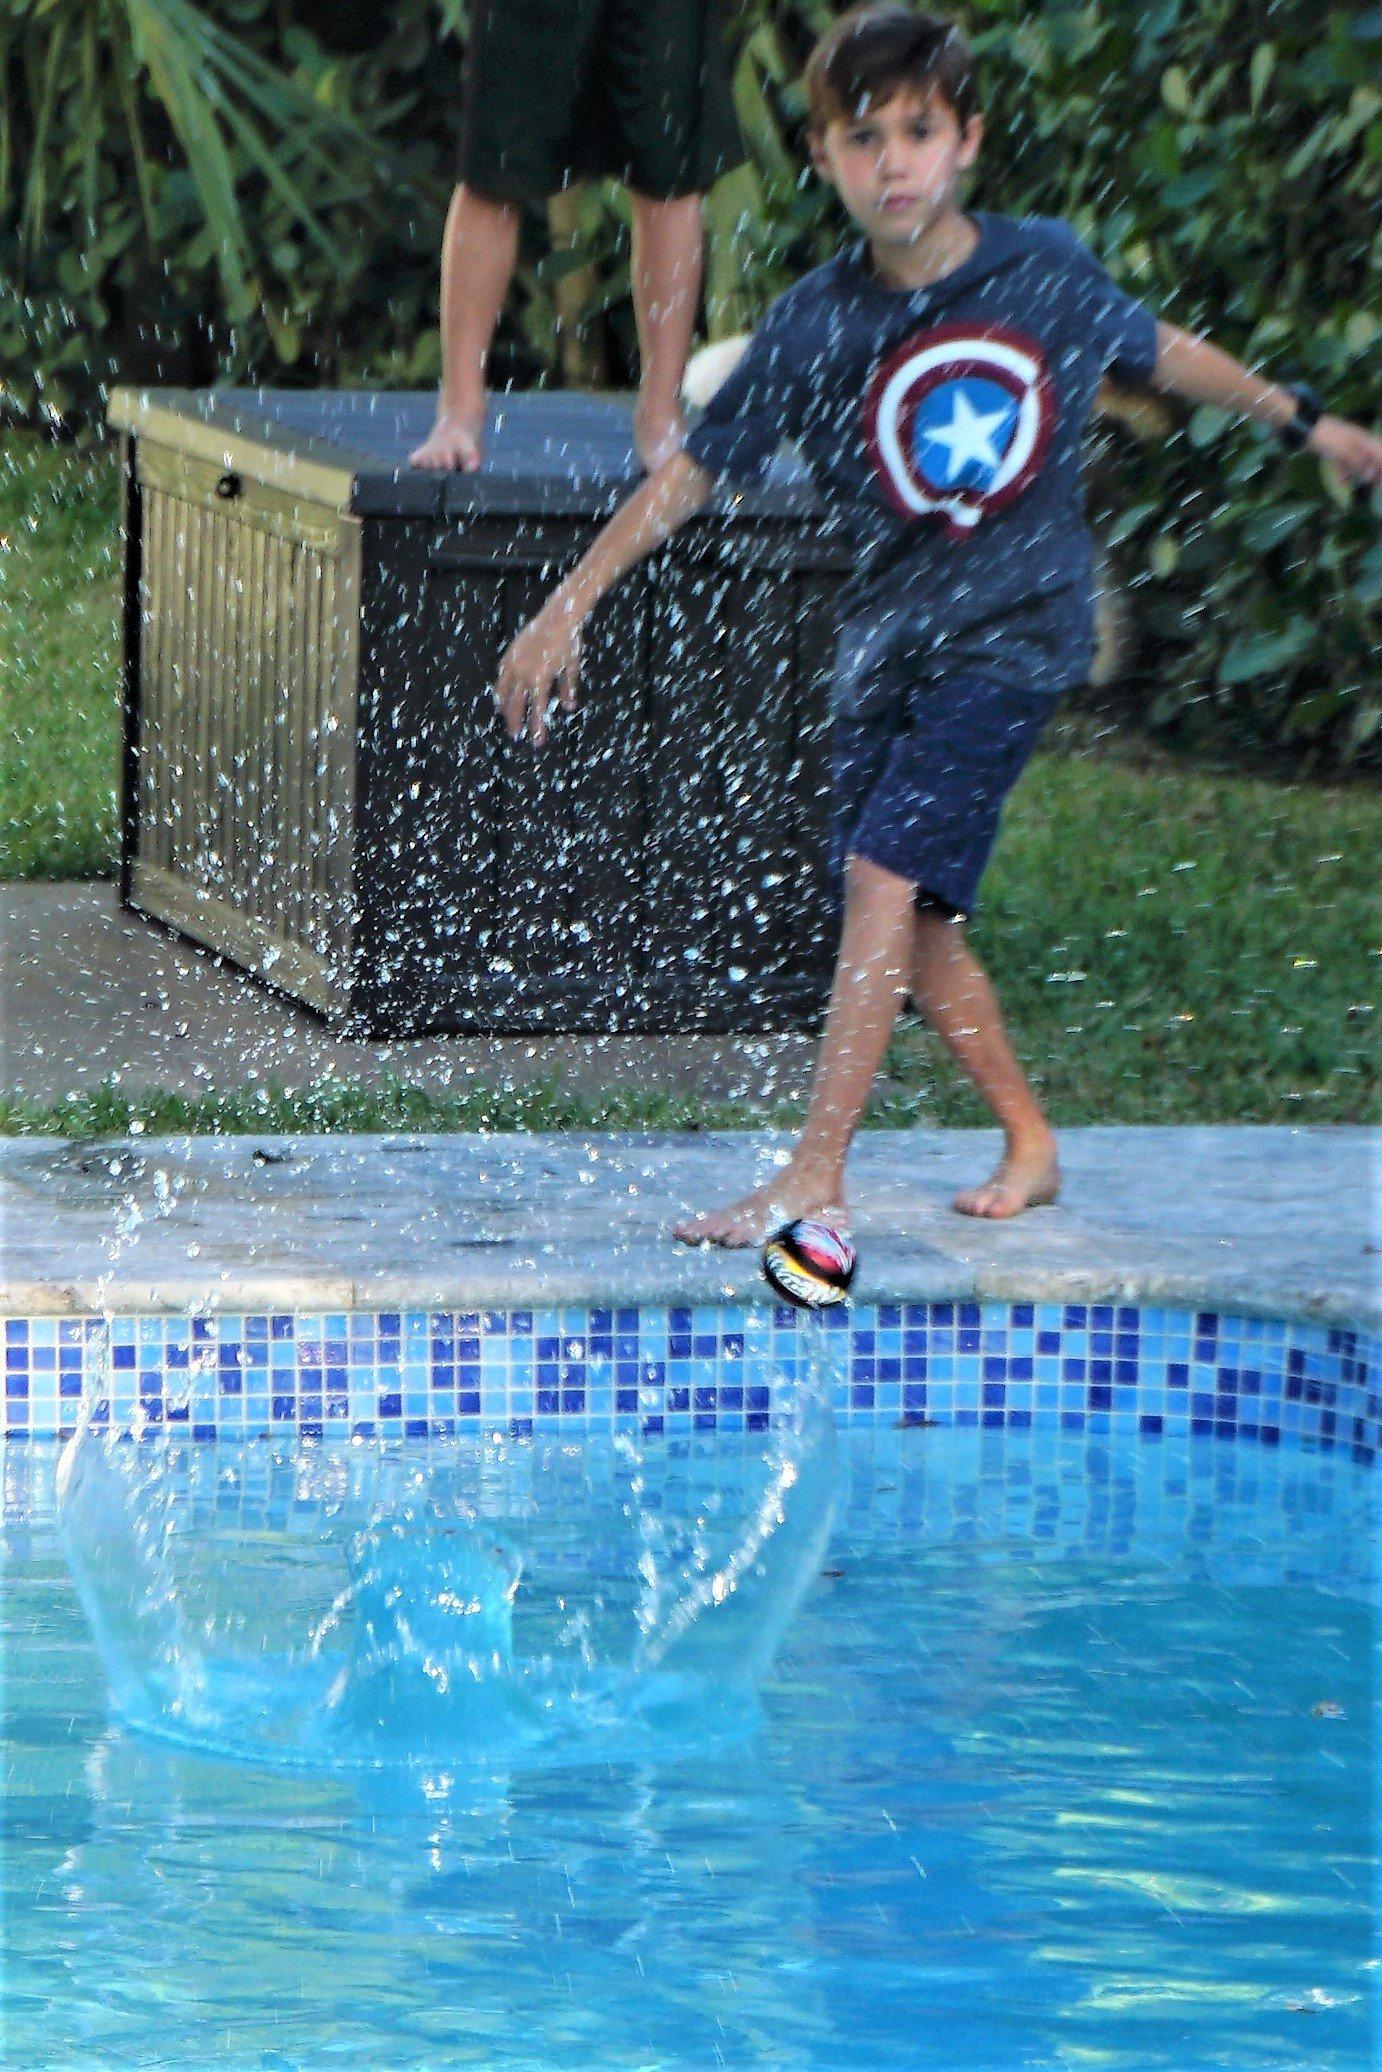 JA-RU Pro Water Hopper Skip it Bouncing Ball (Pack of 72 Units) Bounce & Skips | Item #880-72 by JA-RU (Image #3)